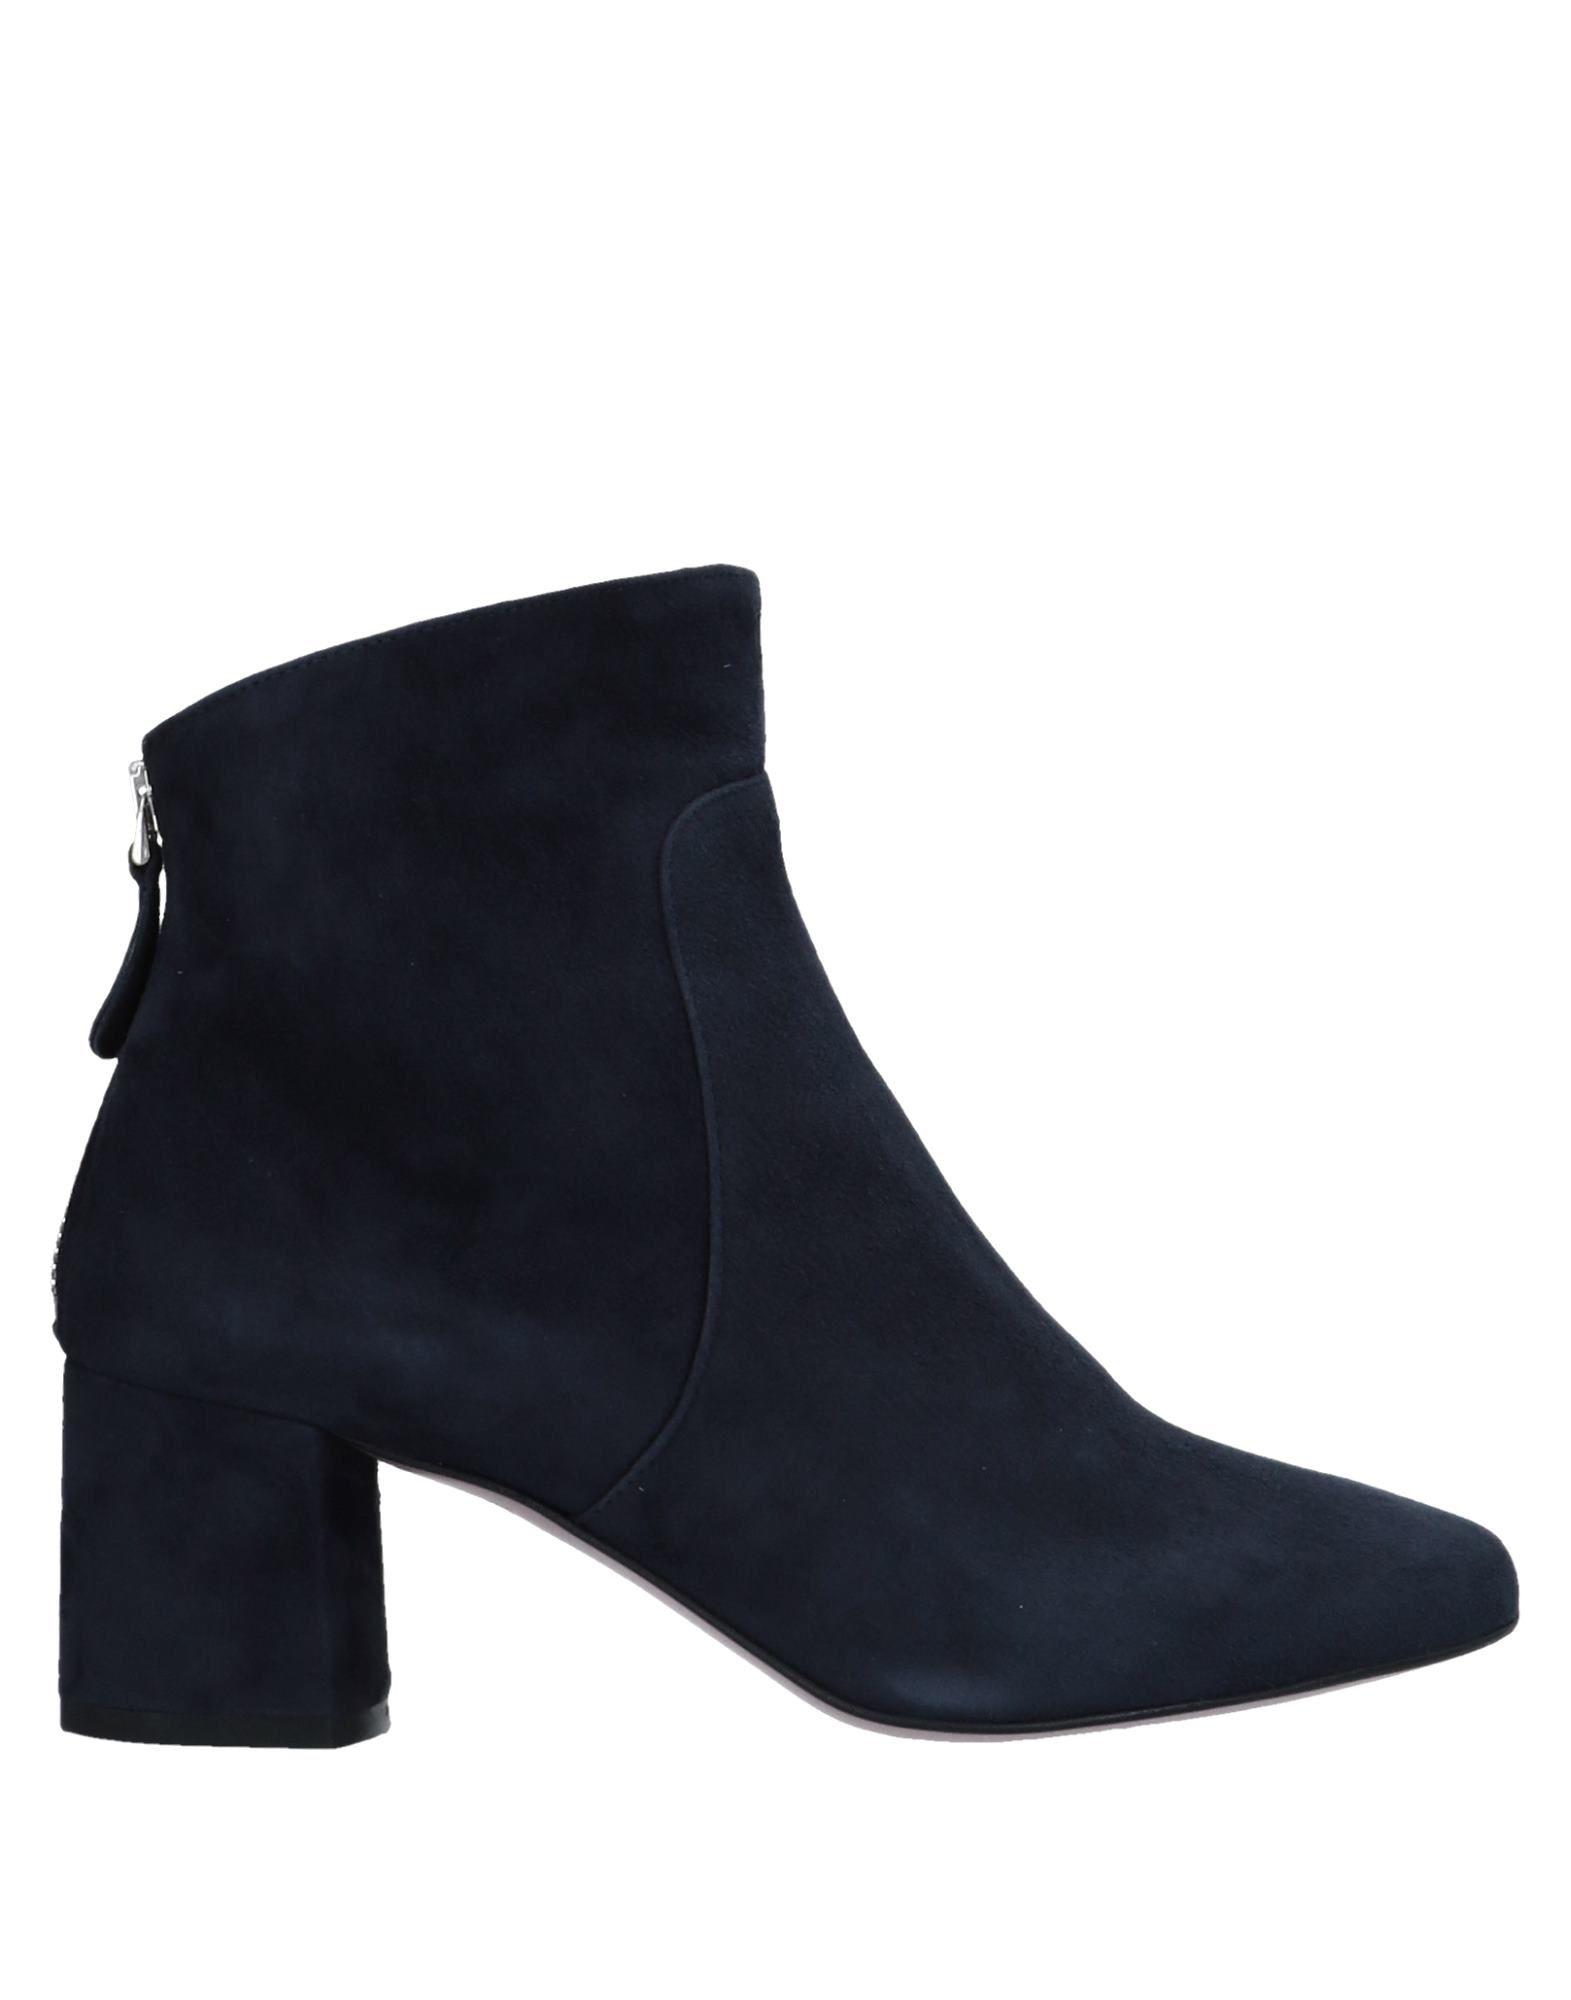 Bottine Albano Femme - Bottines chaussures Albano Bleu foncé Dernières chaussures Bottines discount pour hommes et femmes f38640